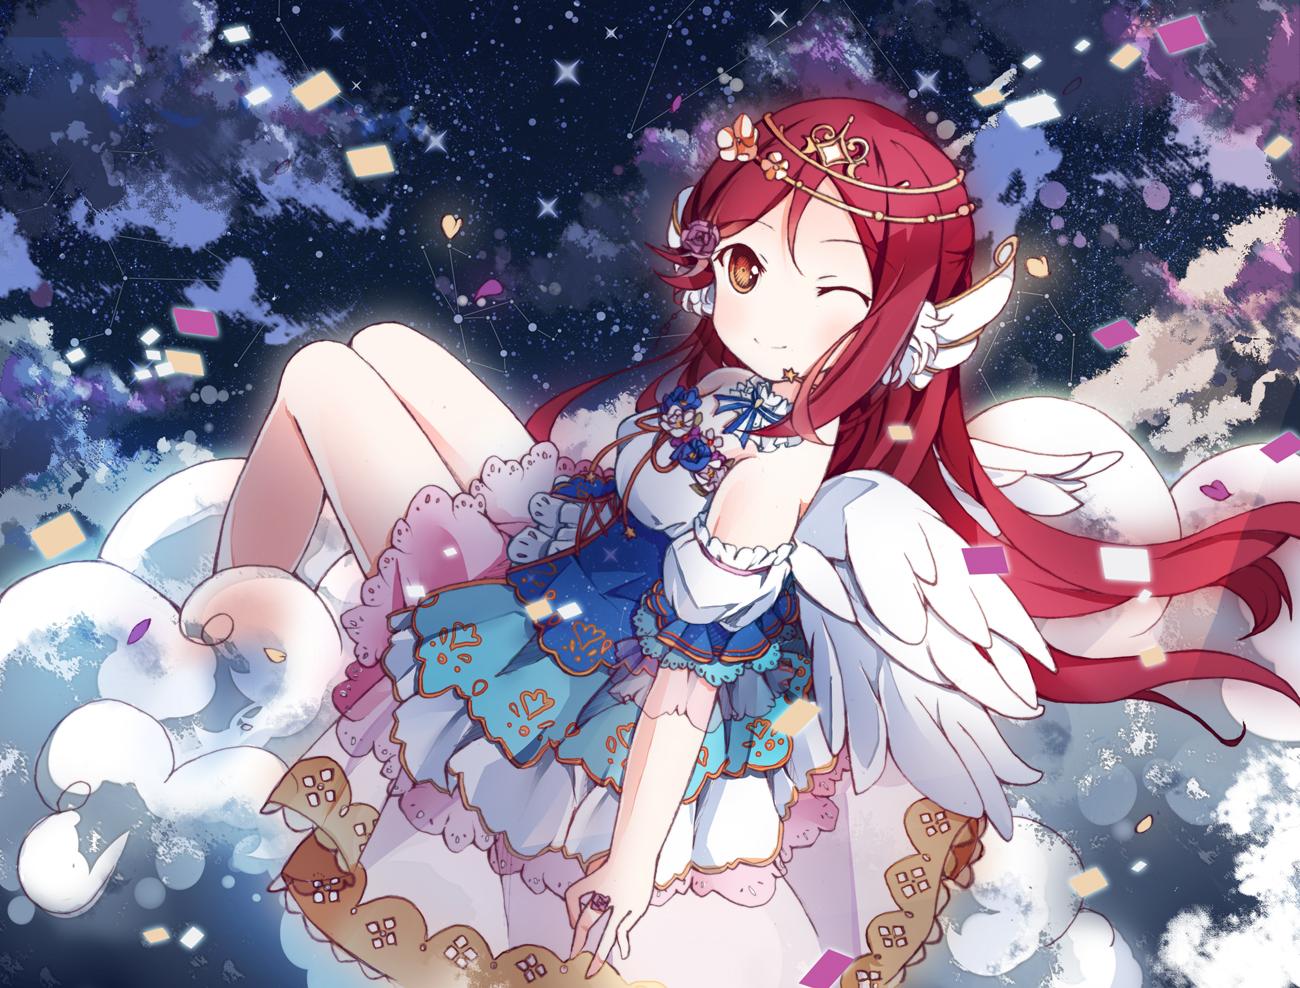 Love Live Anime Iphone Wallpaper : Sakurauchi Riko - Love Live! Sunshine!! - Zerochan Anime ...